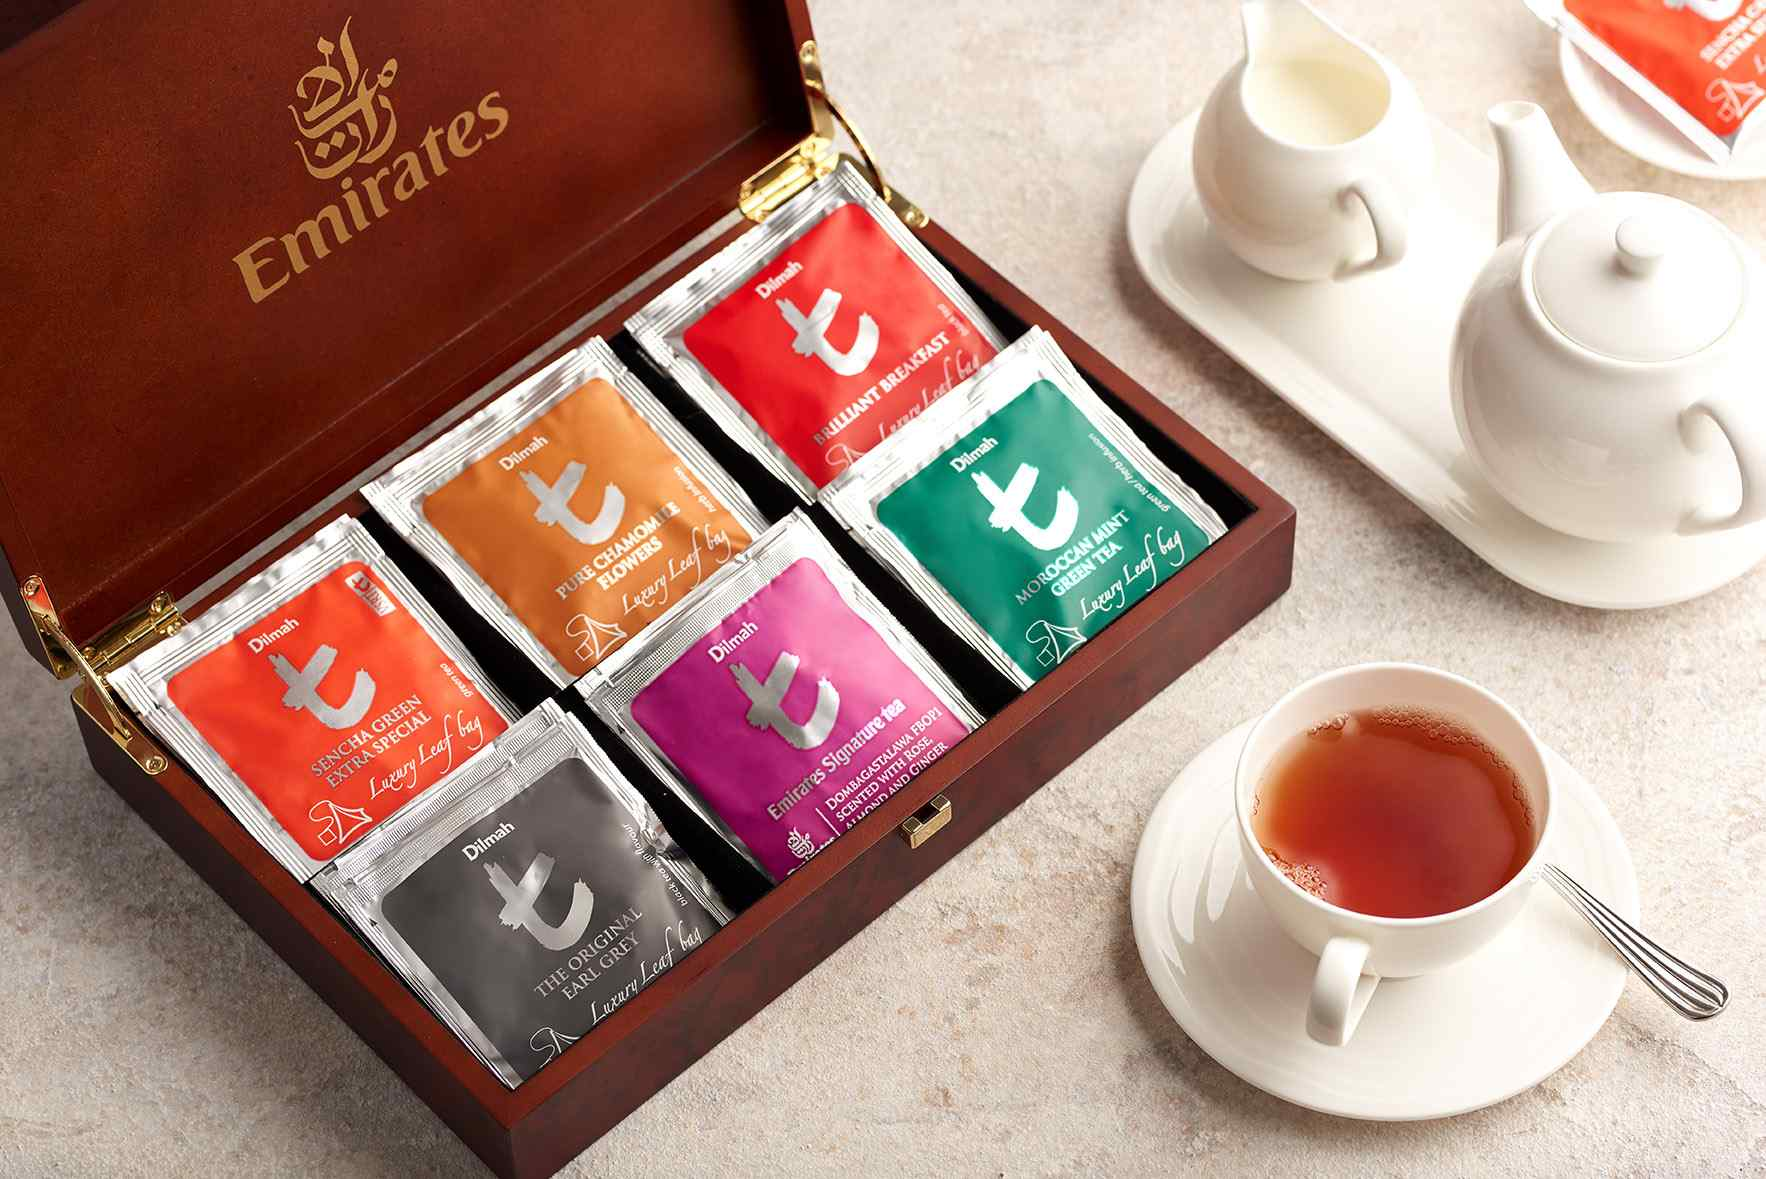 Auswahl an Dilmah Tessorten bei Emirates